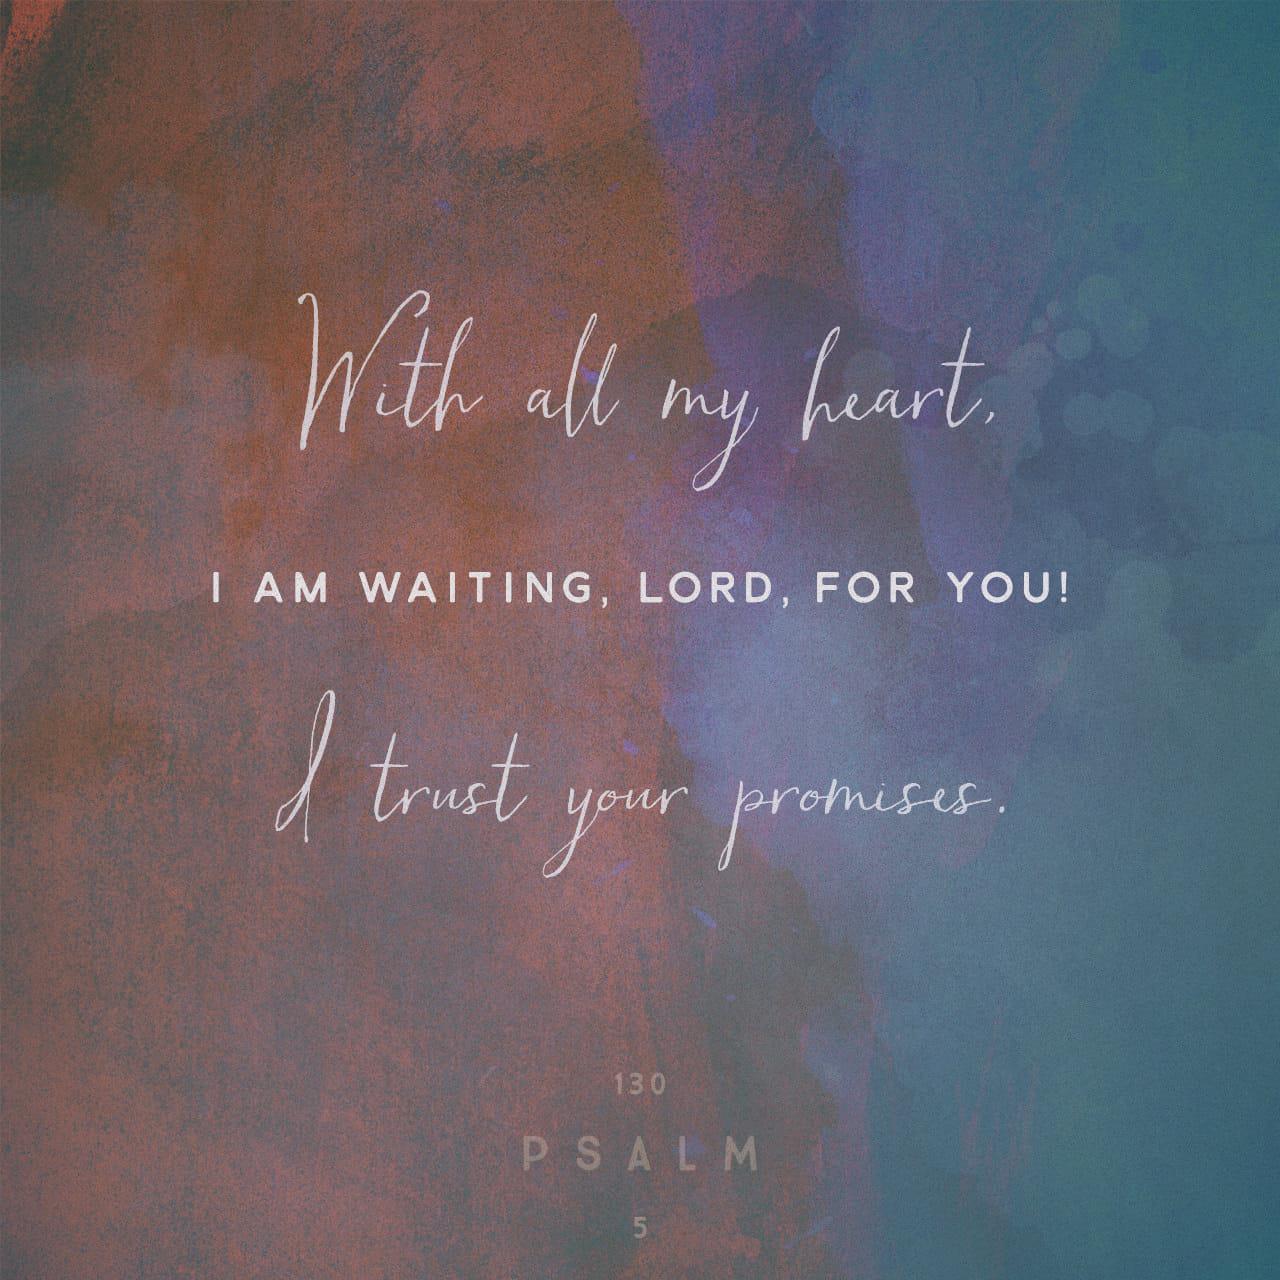 Psalm 130:5-6 NIV